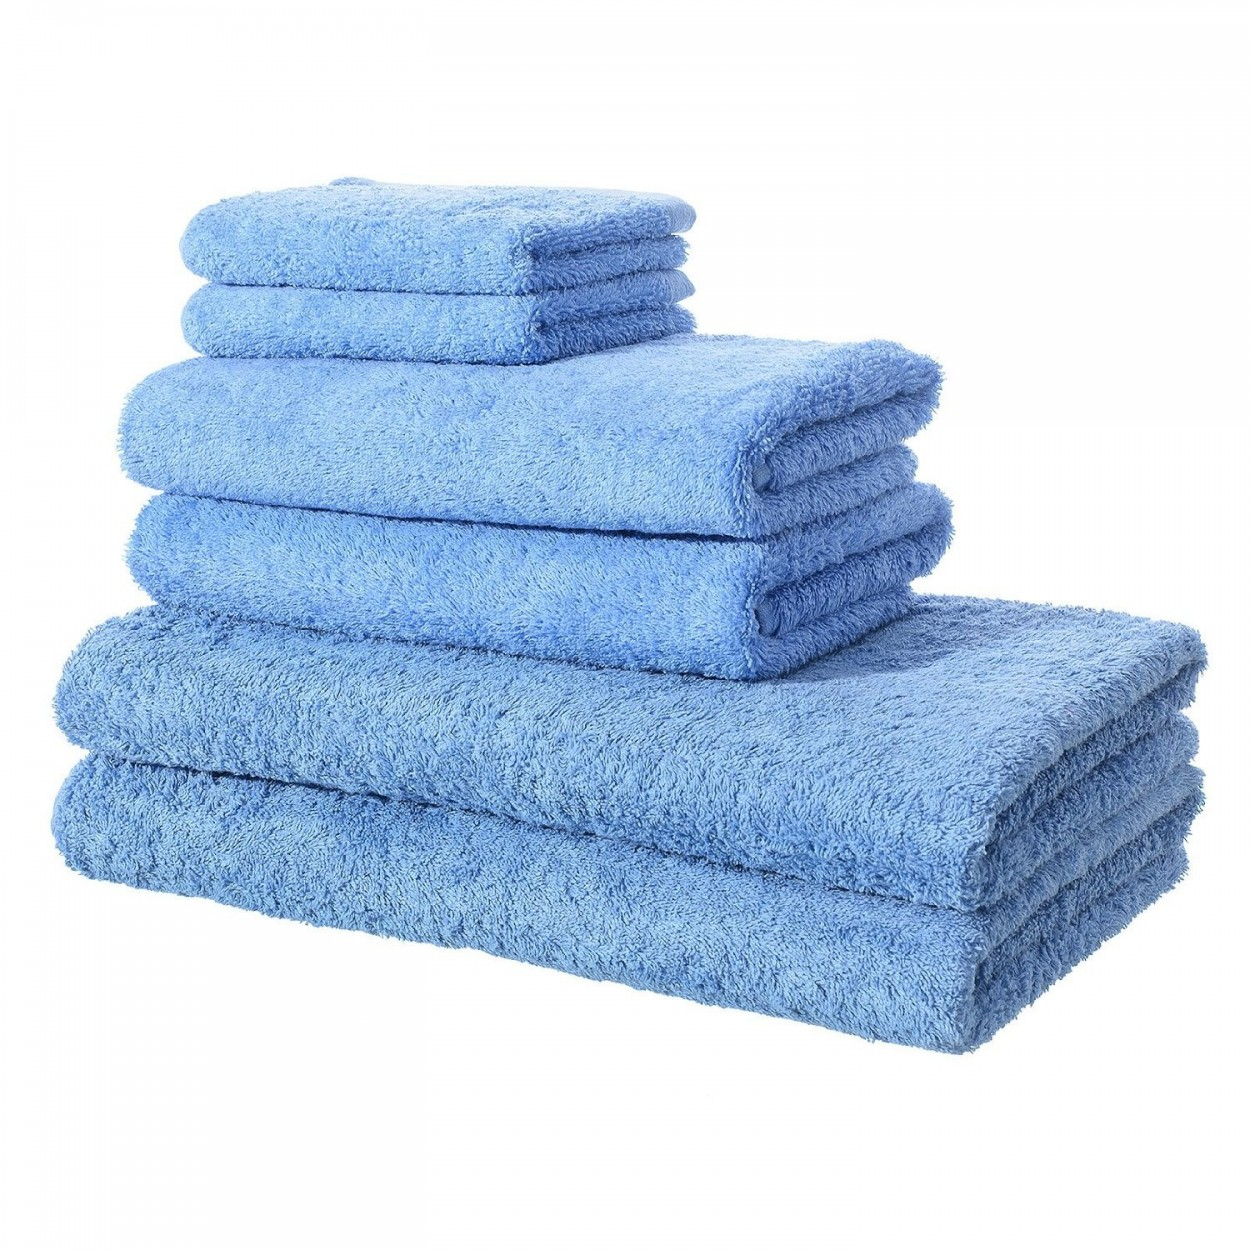 Toallas de ba o color azul hogar y m s - Toallas para bano ...